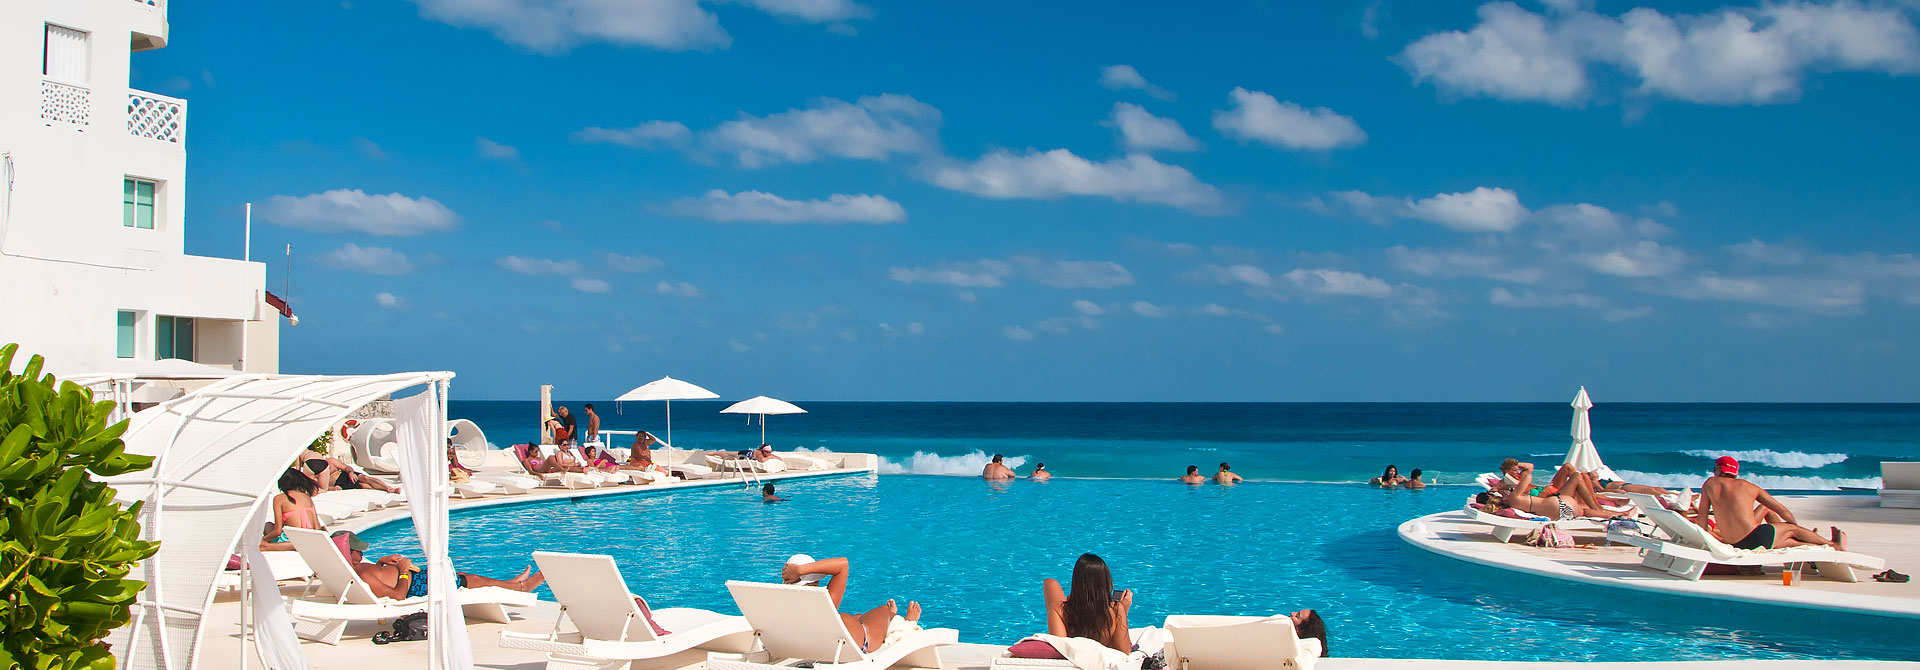 Travel journal, Yucatan - Reseskildring från Yucatan